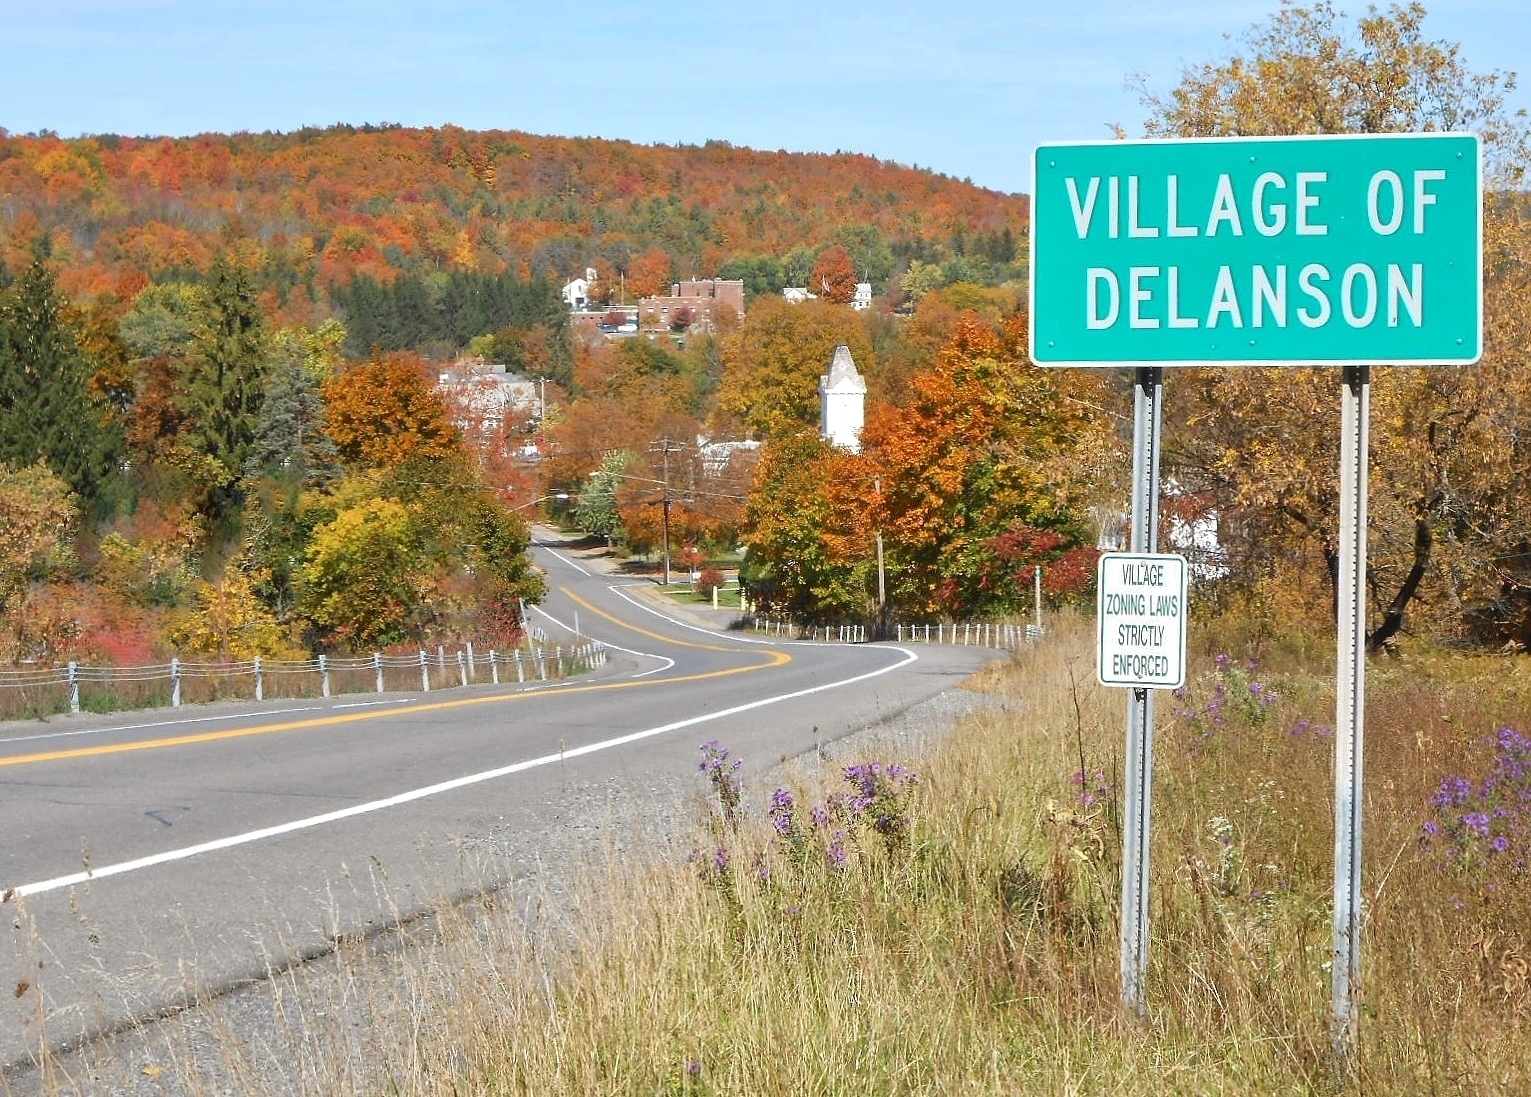 Village of Delanson, NY | Incorporated in 1921delanson village